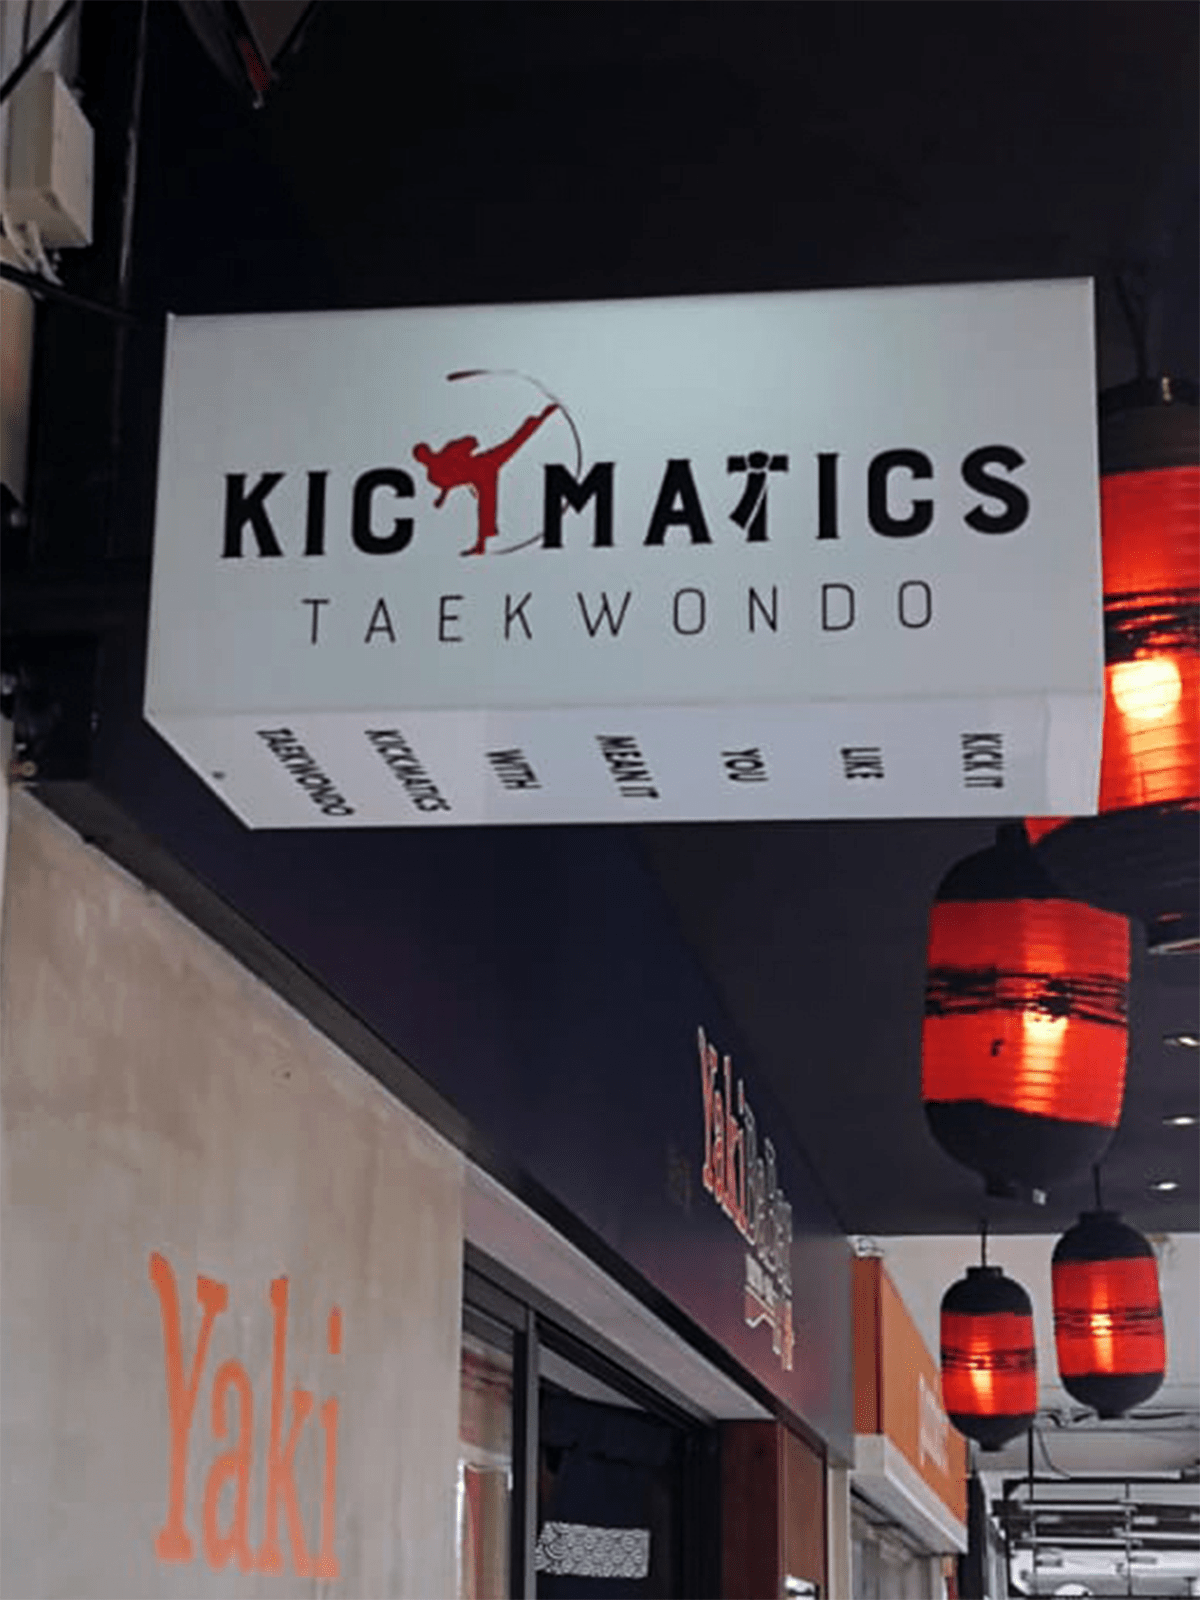 kickmatics taekwondo